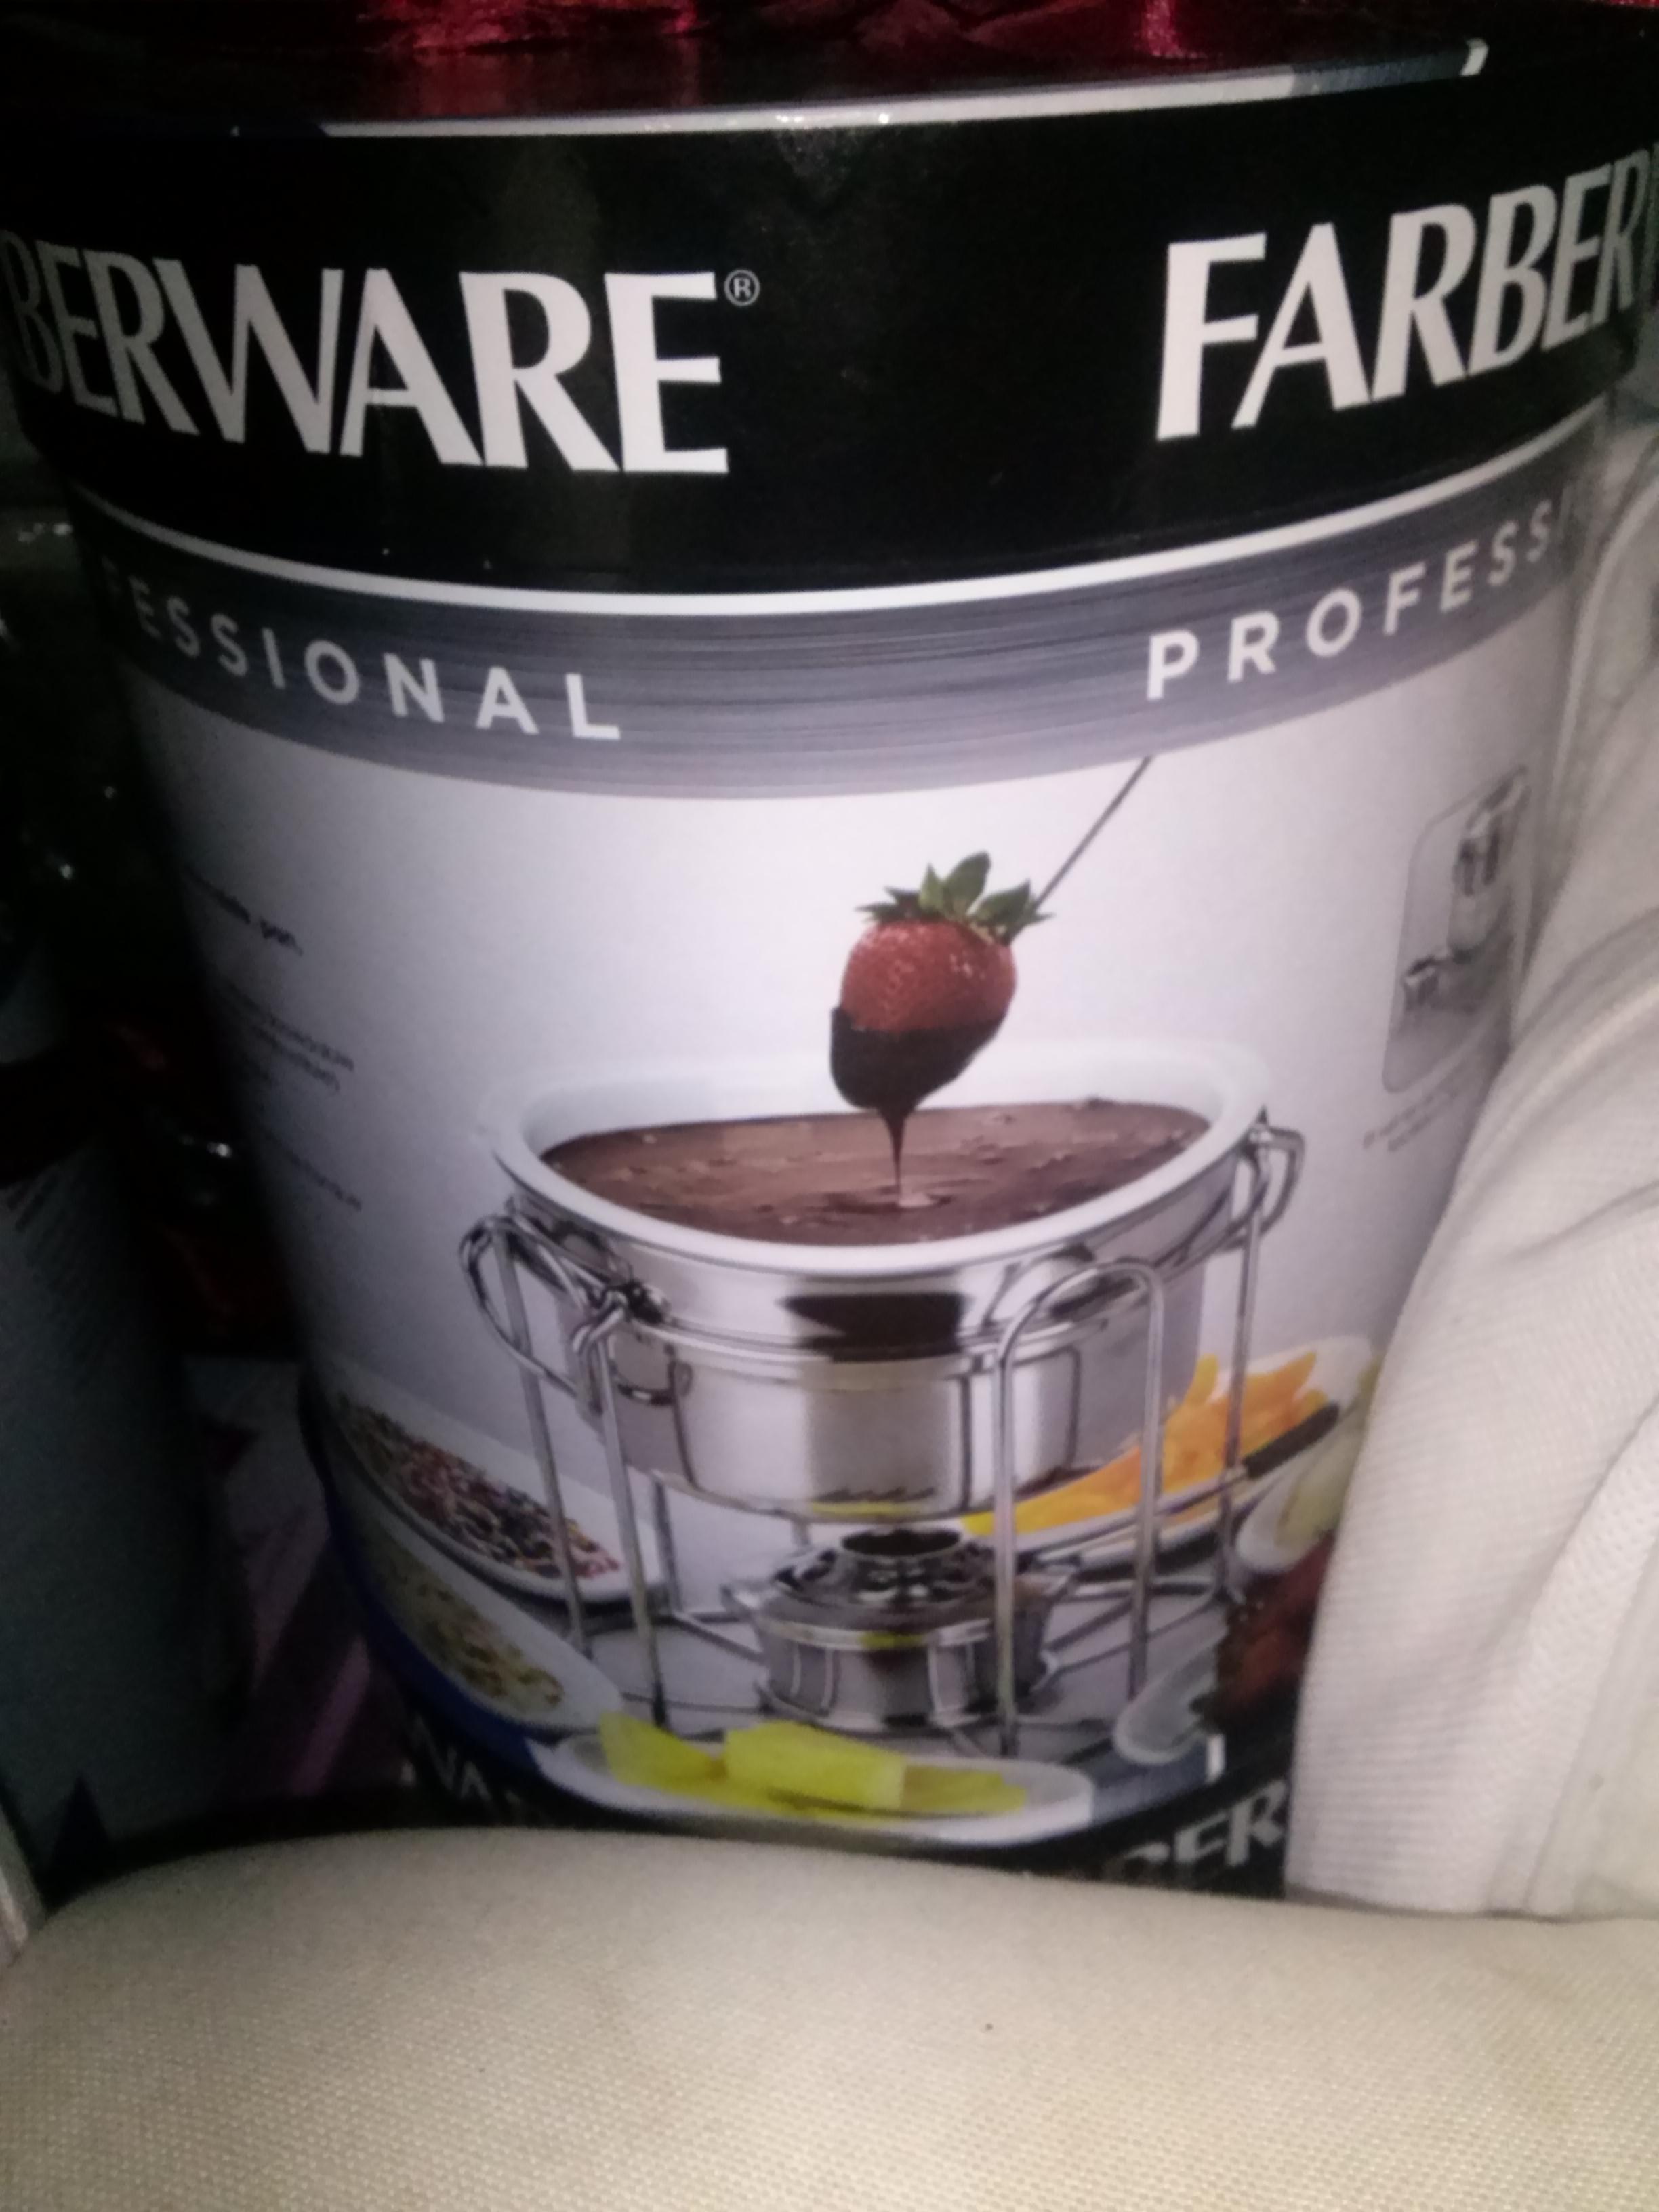 walmart set fondue 20.03